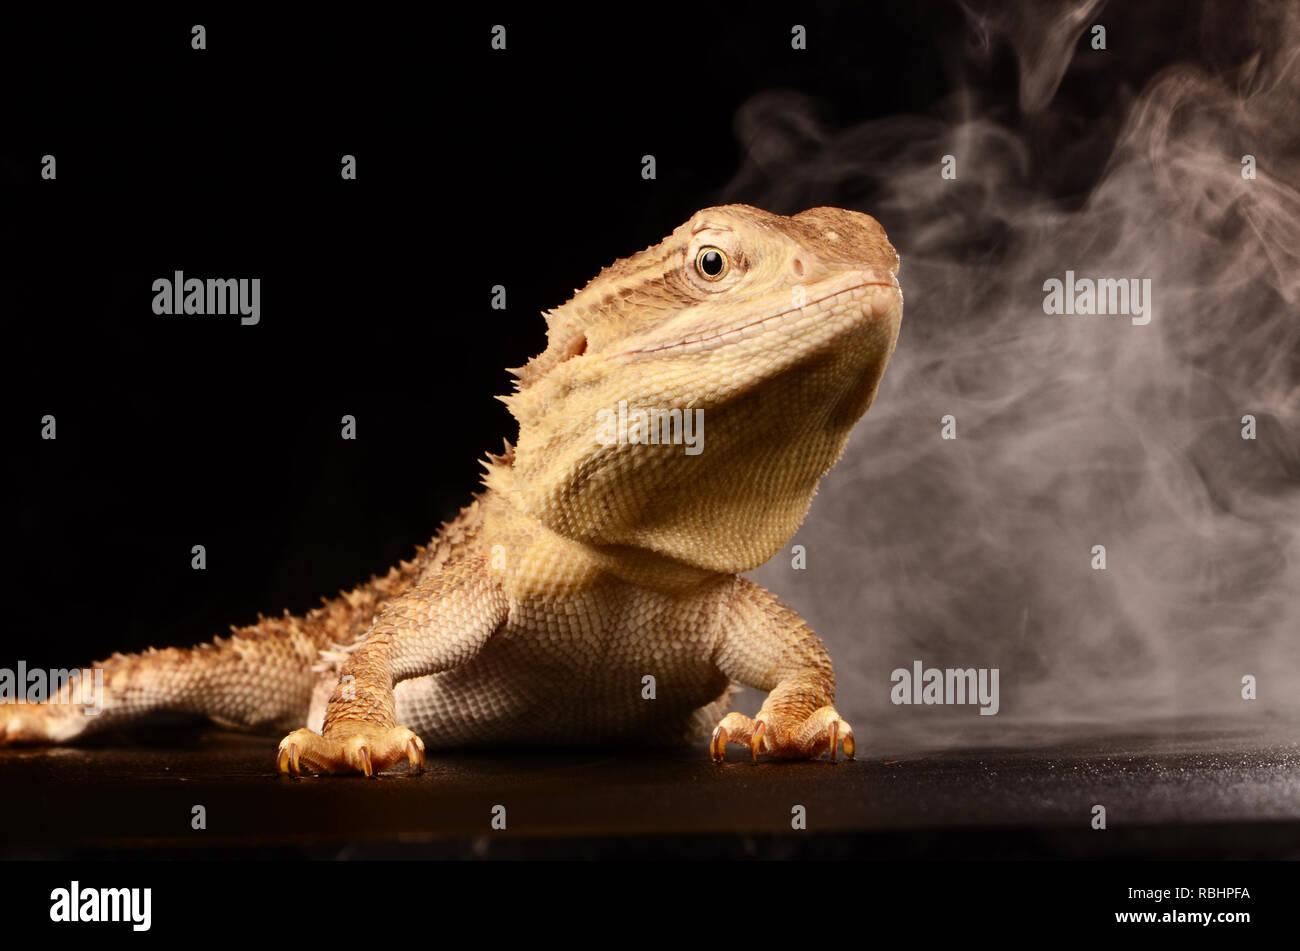 Rankins Dragon Lizard - Stock Image